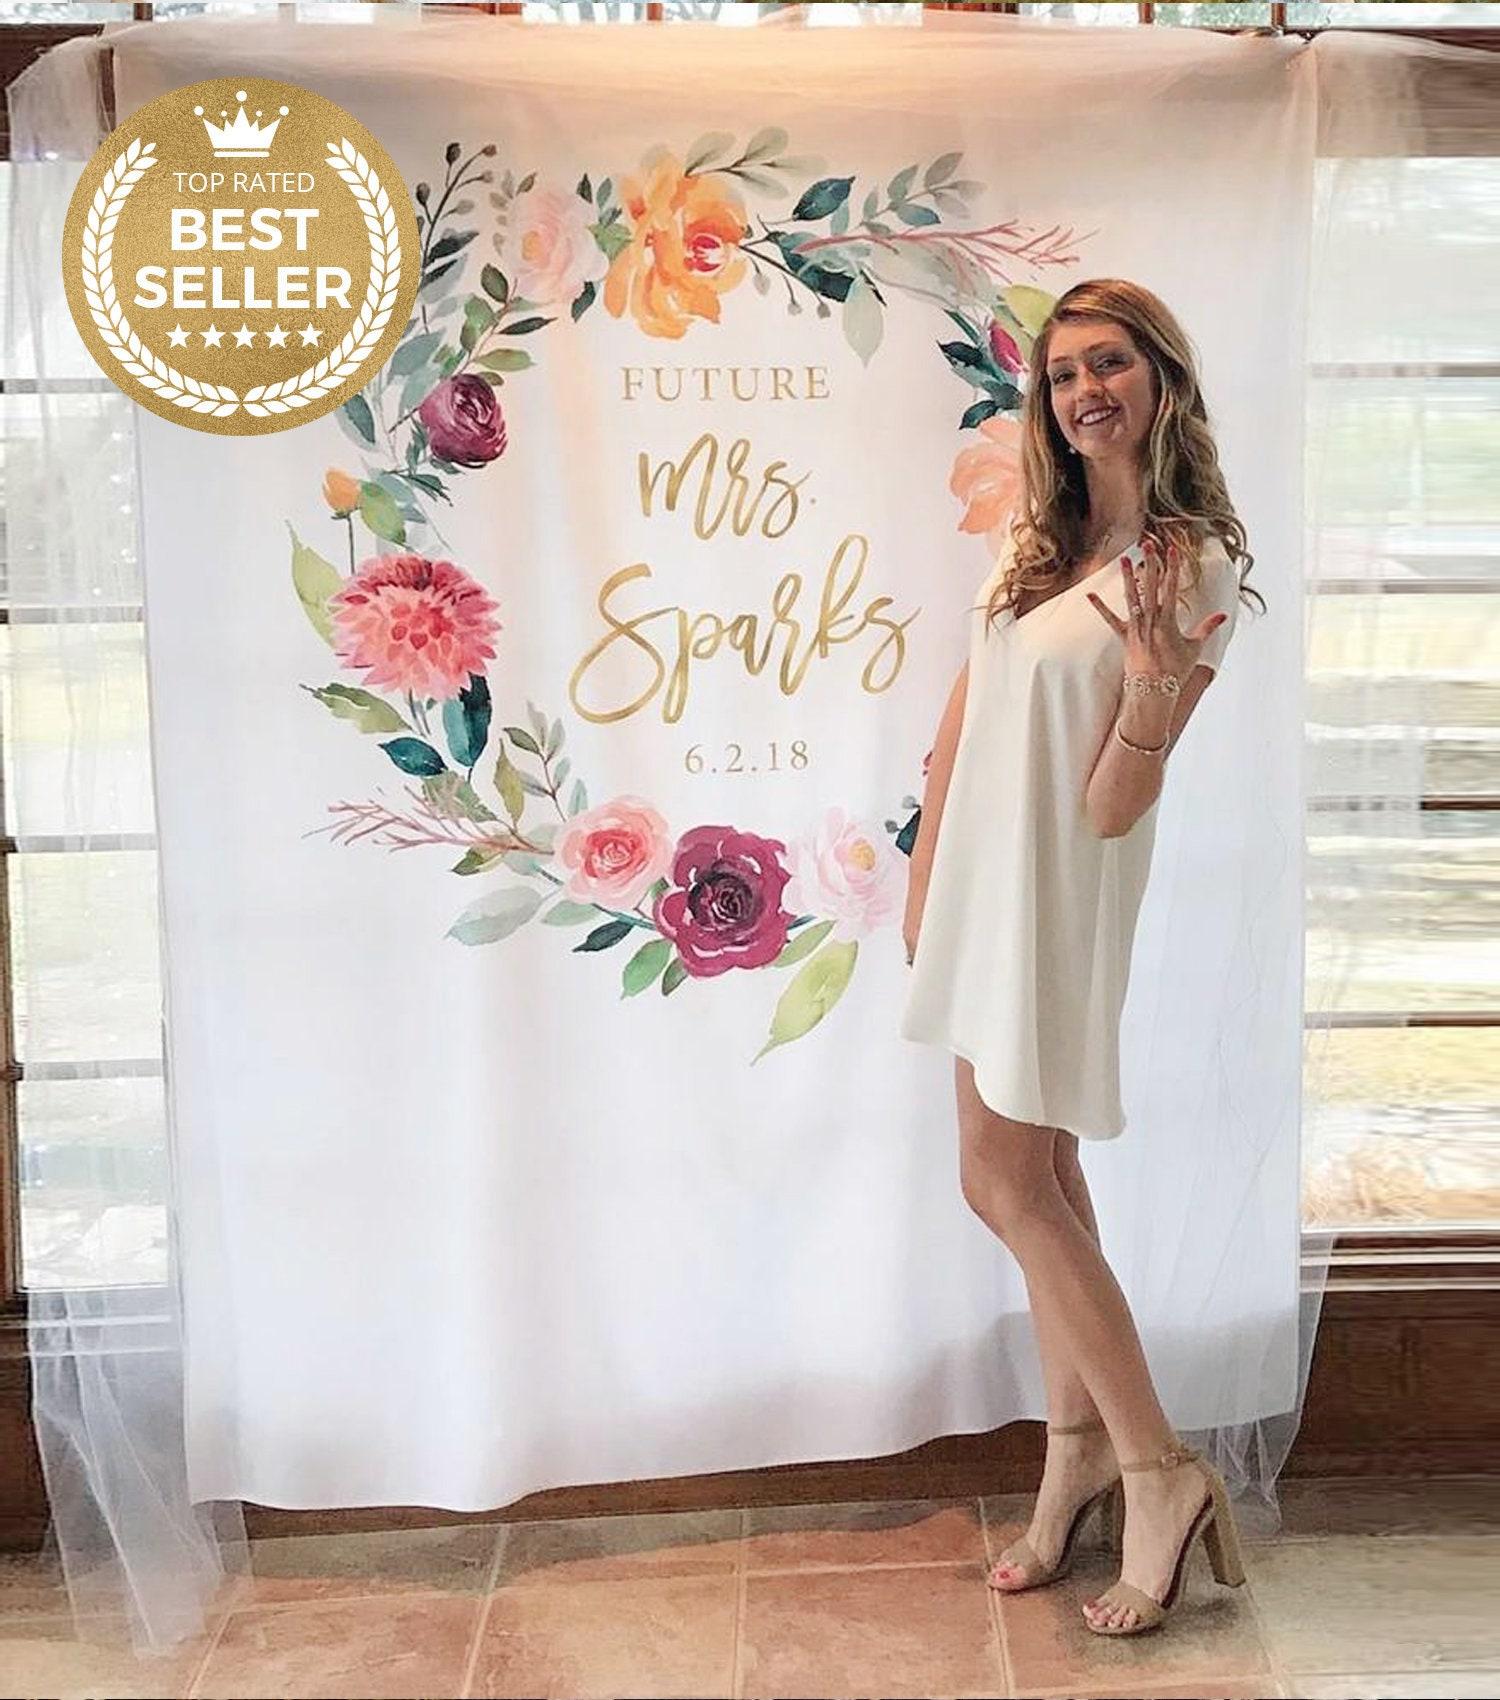 engagement party decor blush watercolor flower bridal shower decorations bachelorette boho custom name sign Future mr and mrs banner